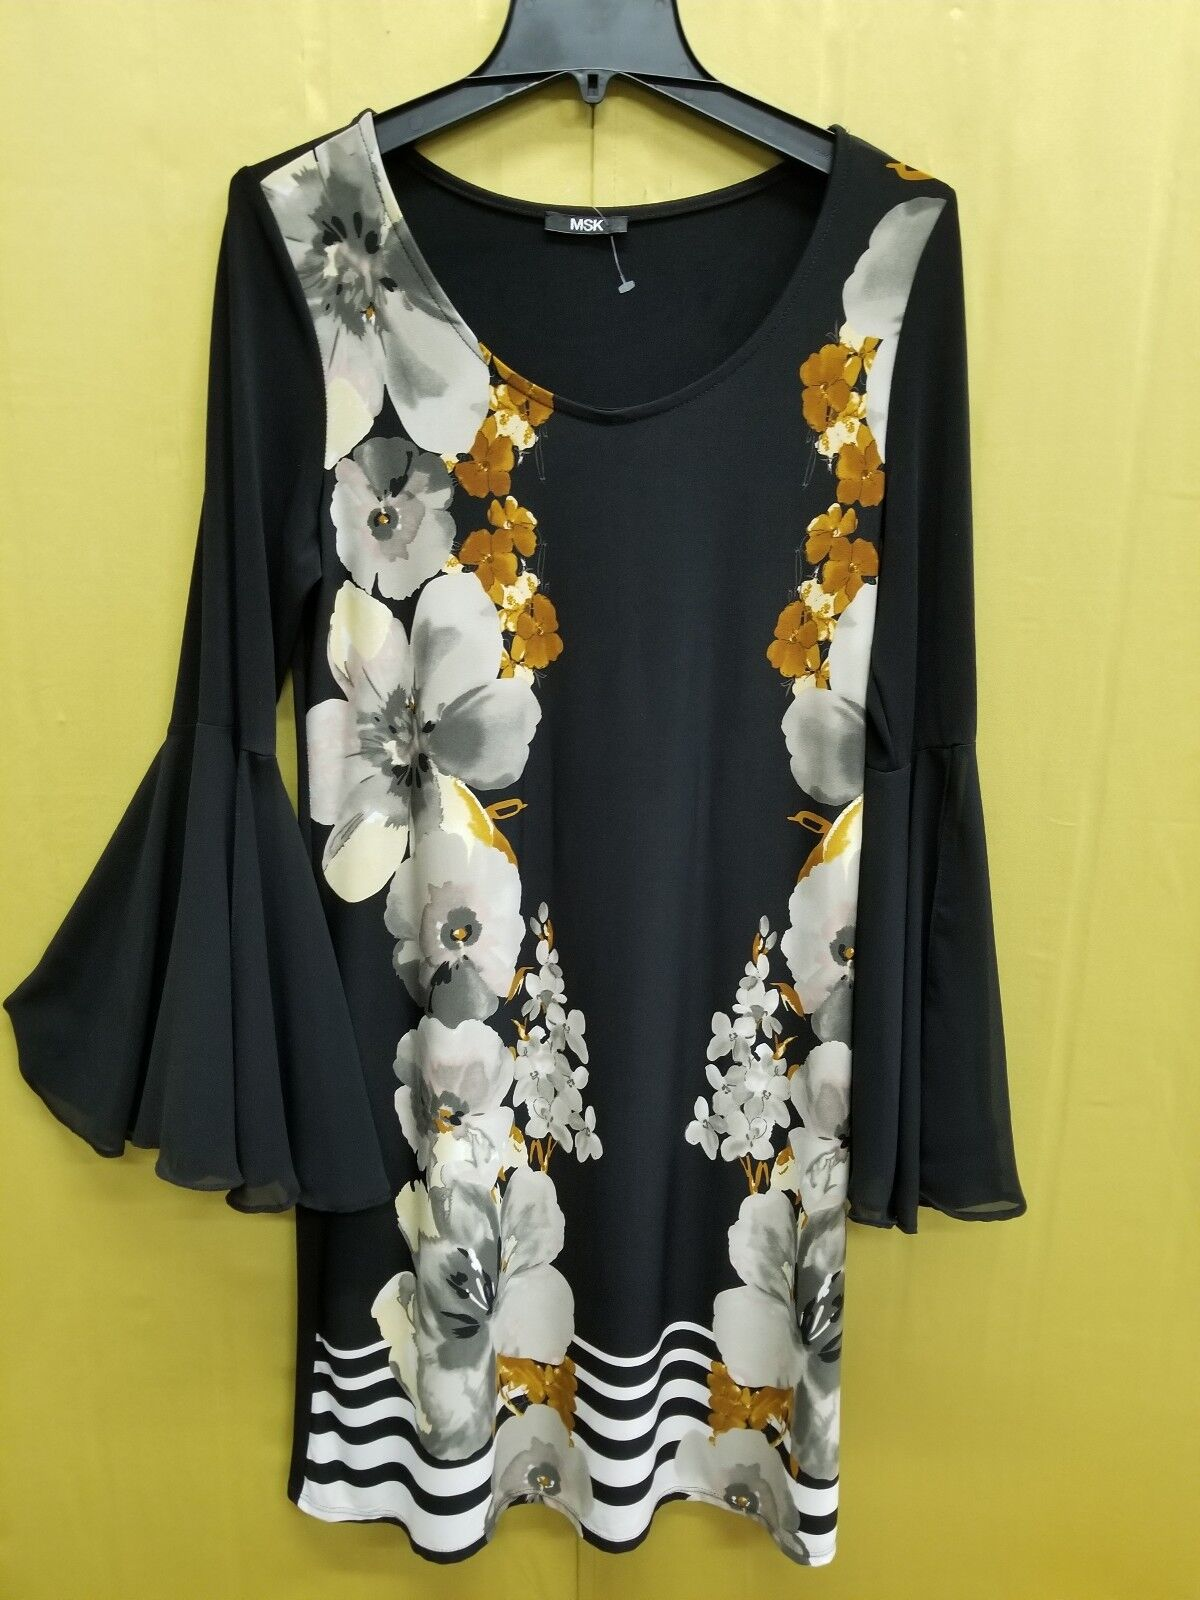 MSK Womens Bell Sleeves Mini Daytime Casual Dress NEW